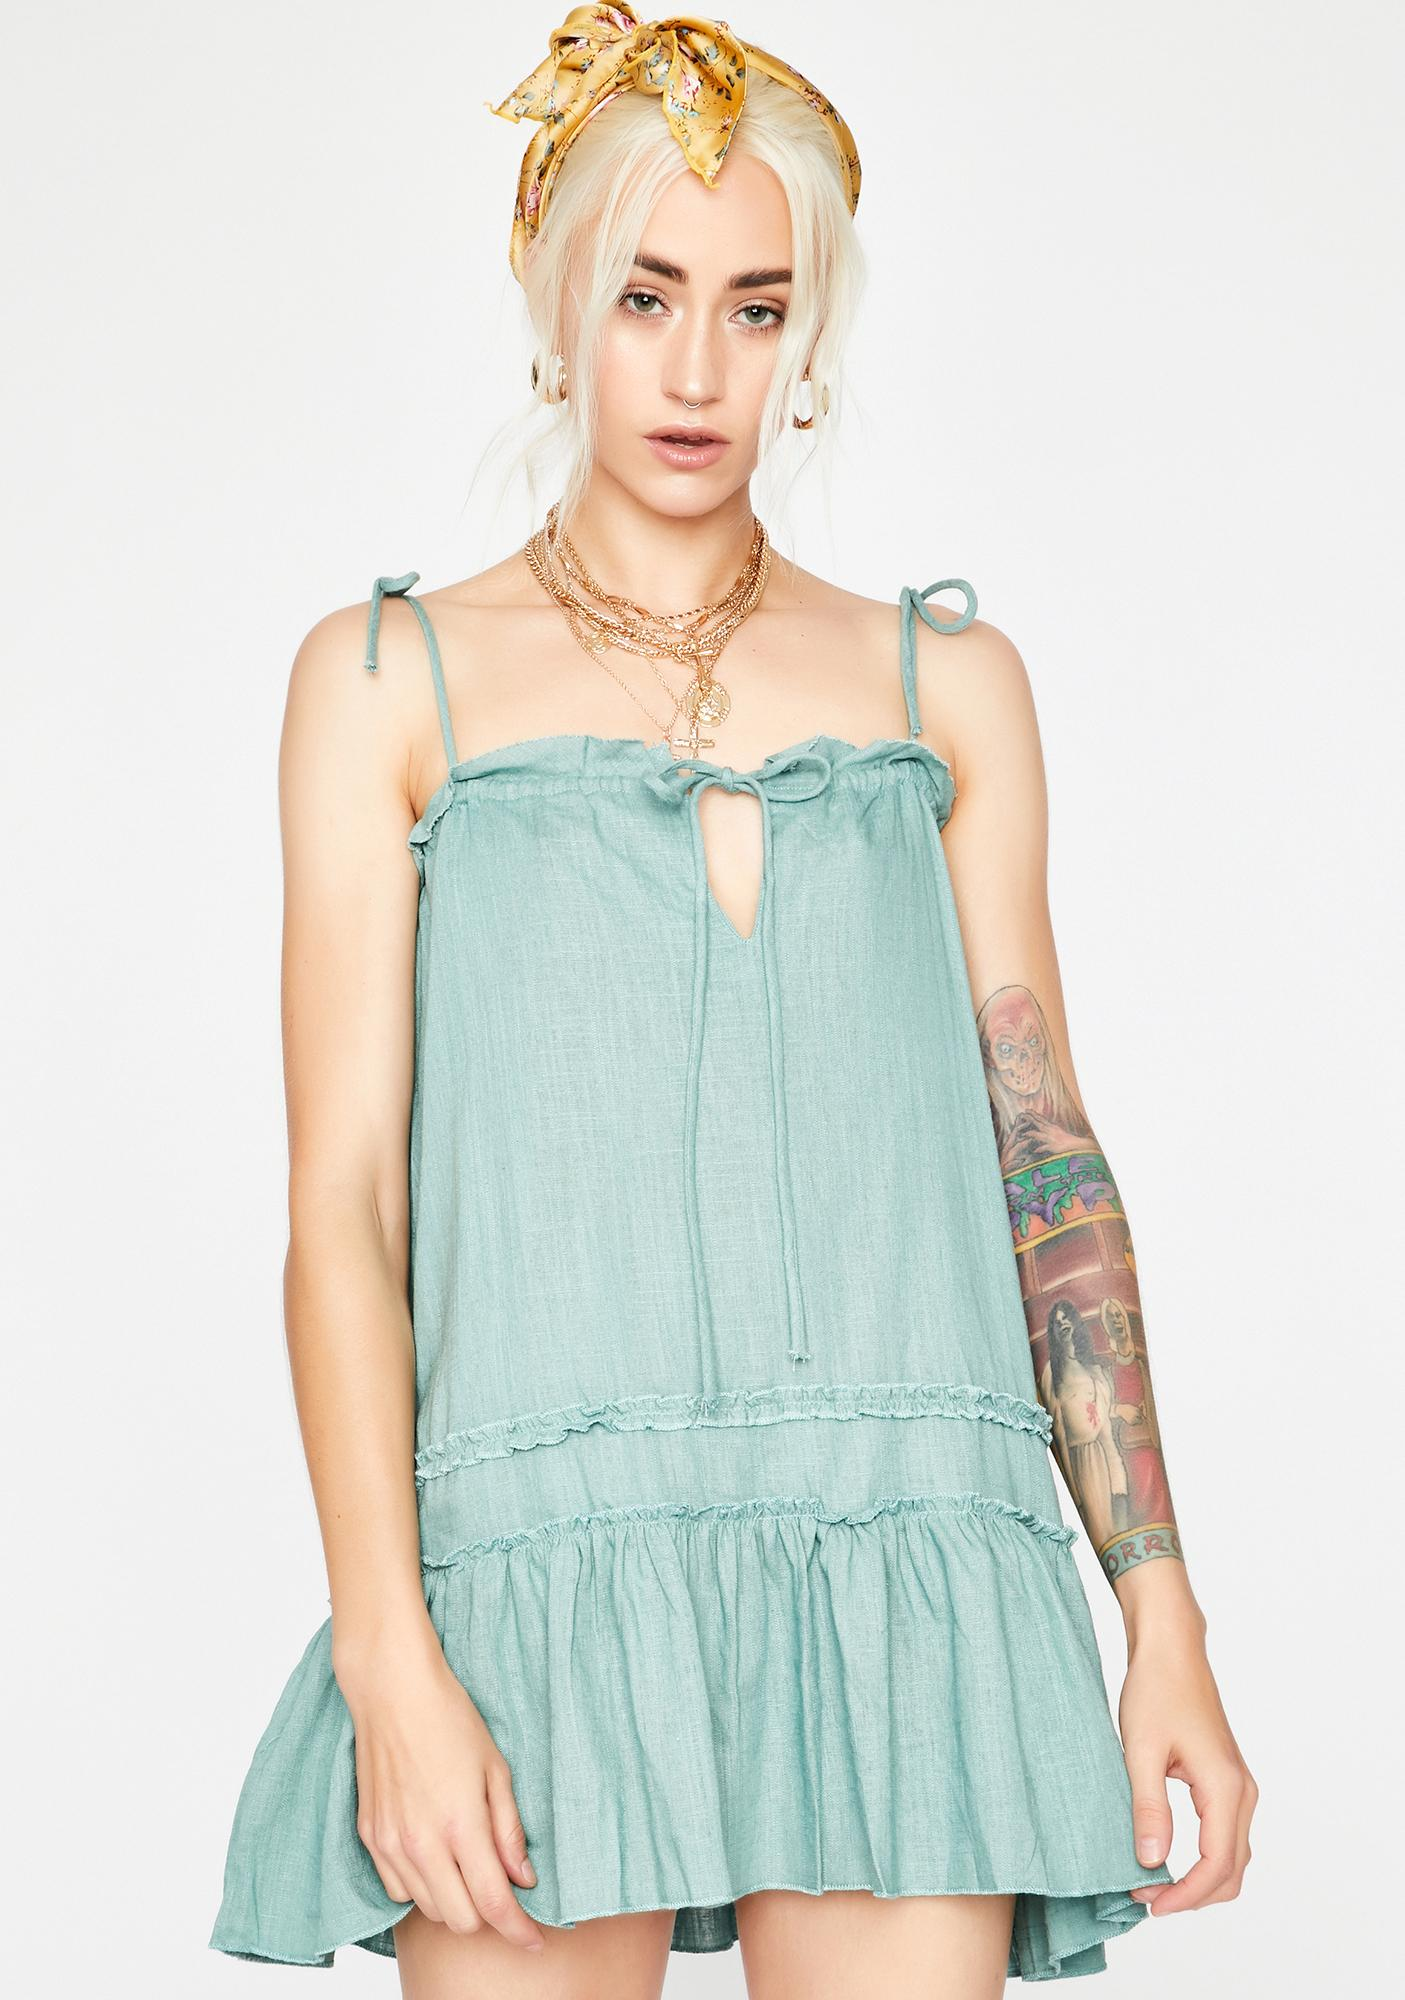 Kush Summertime Gladness Ruffled Dress